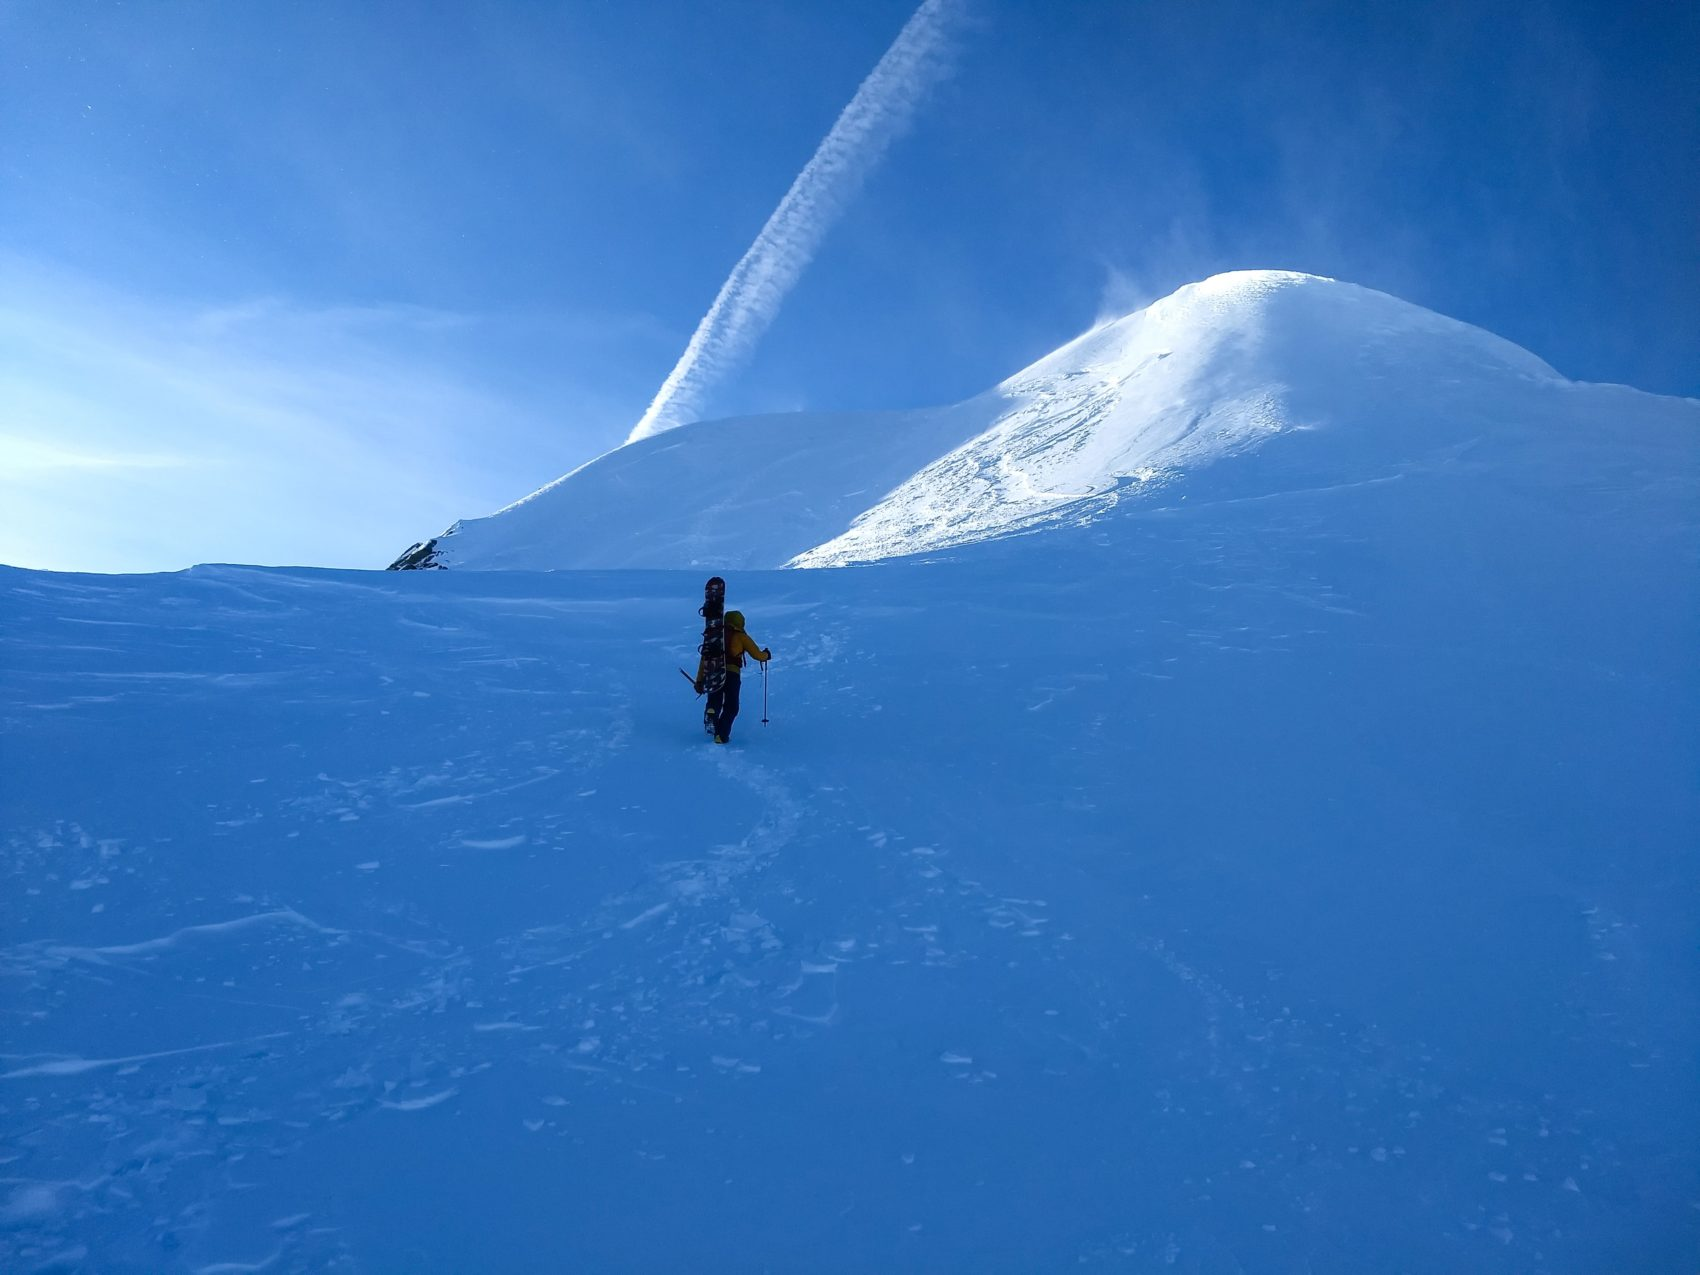 climber ascending rogers peak